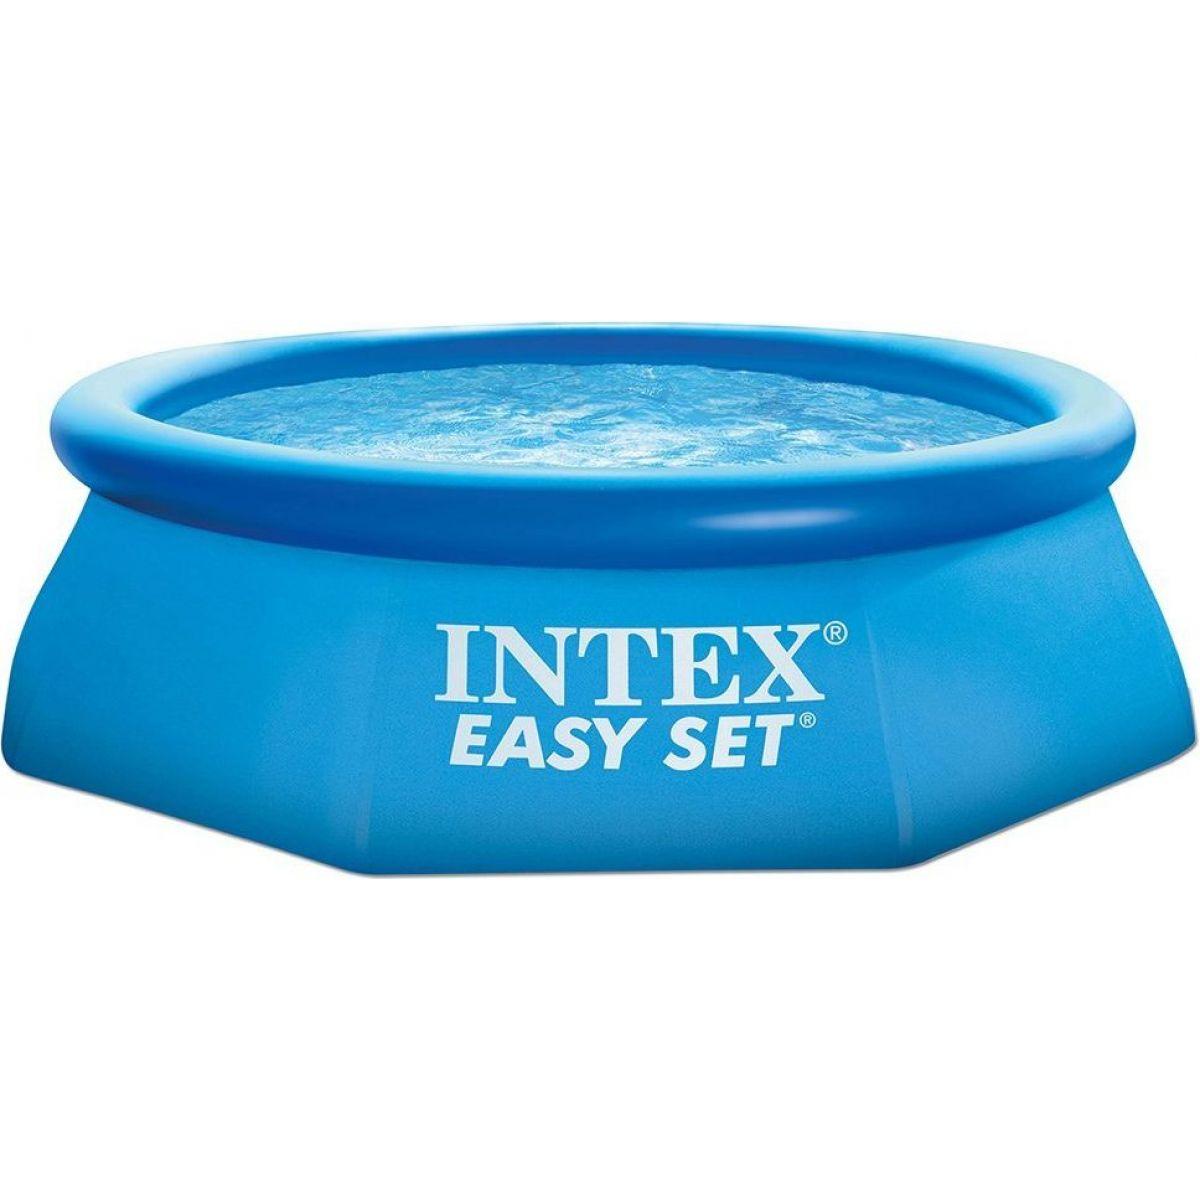 Intex 28112 Easy set Bazén 244x76cm - Poškozený obal